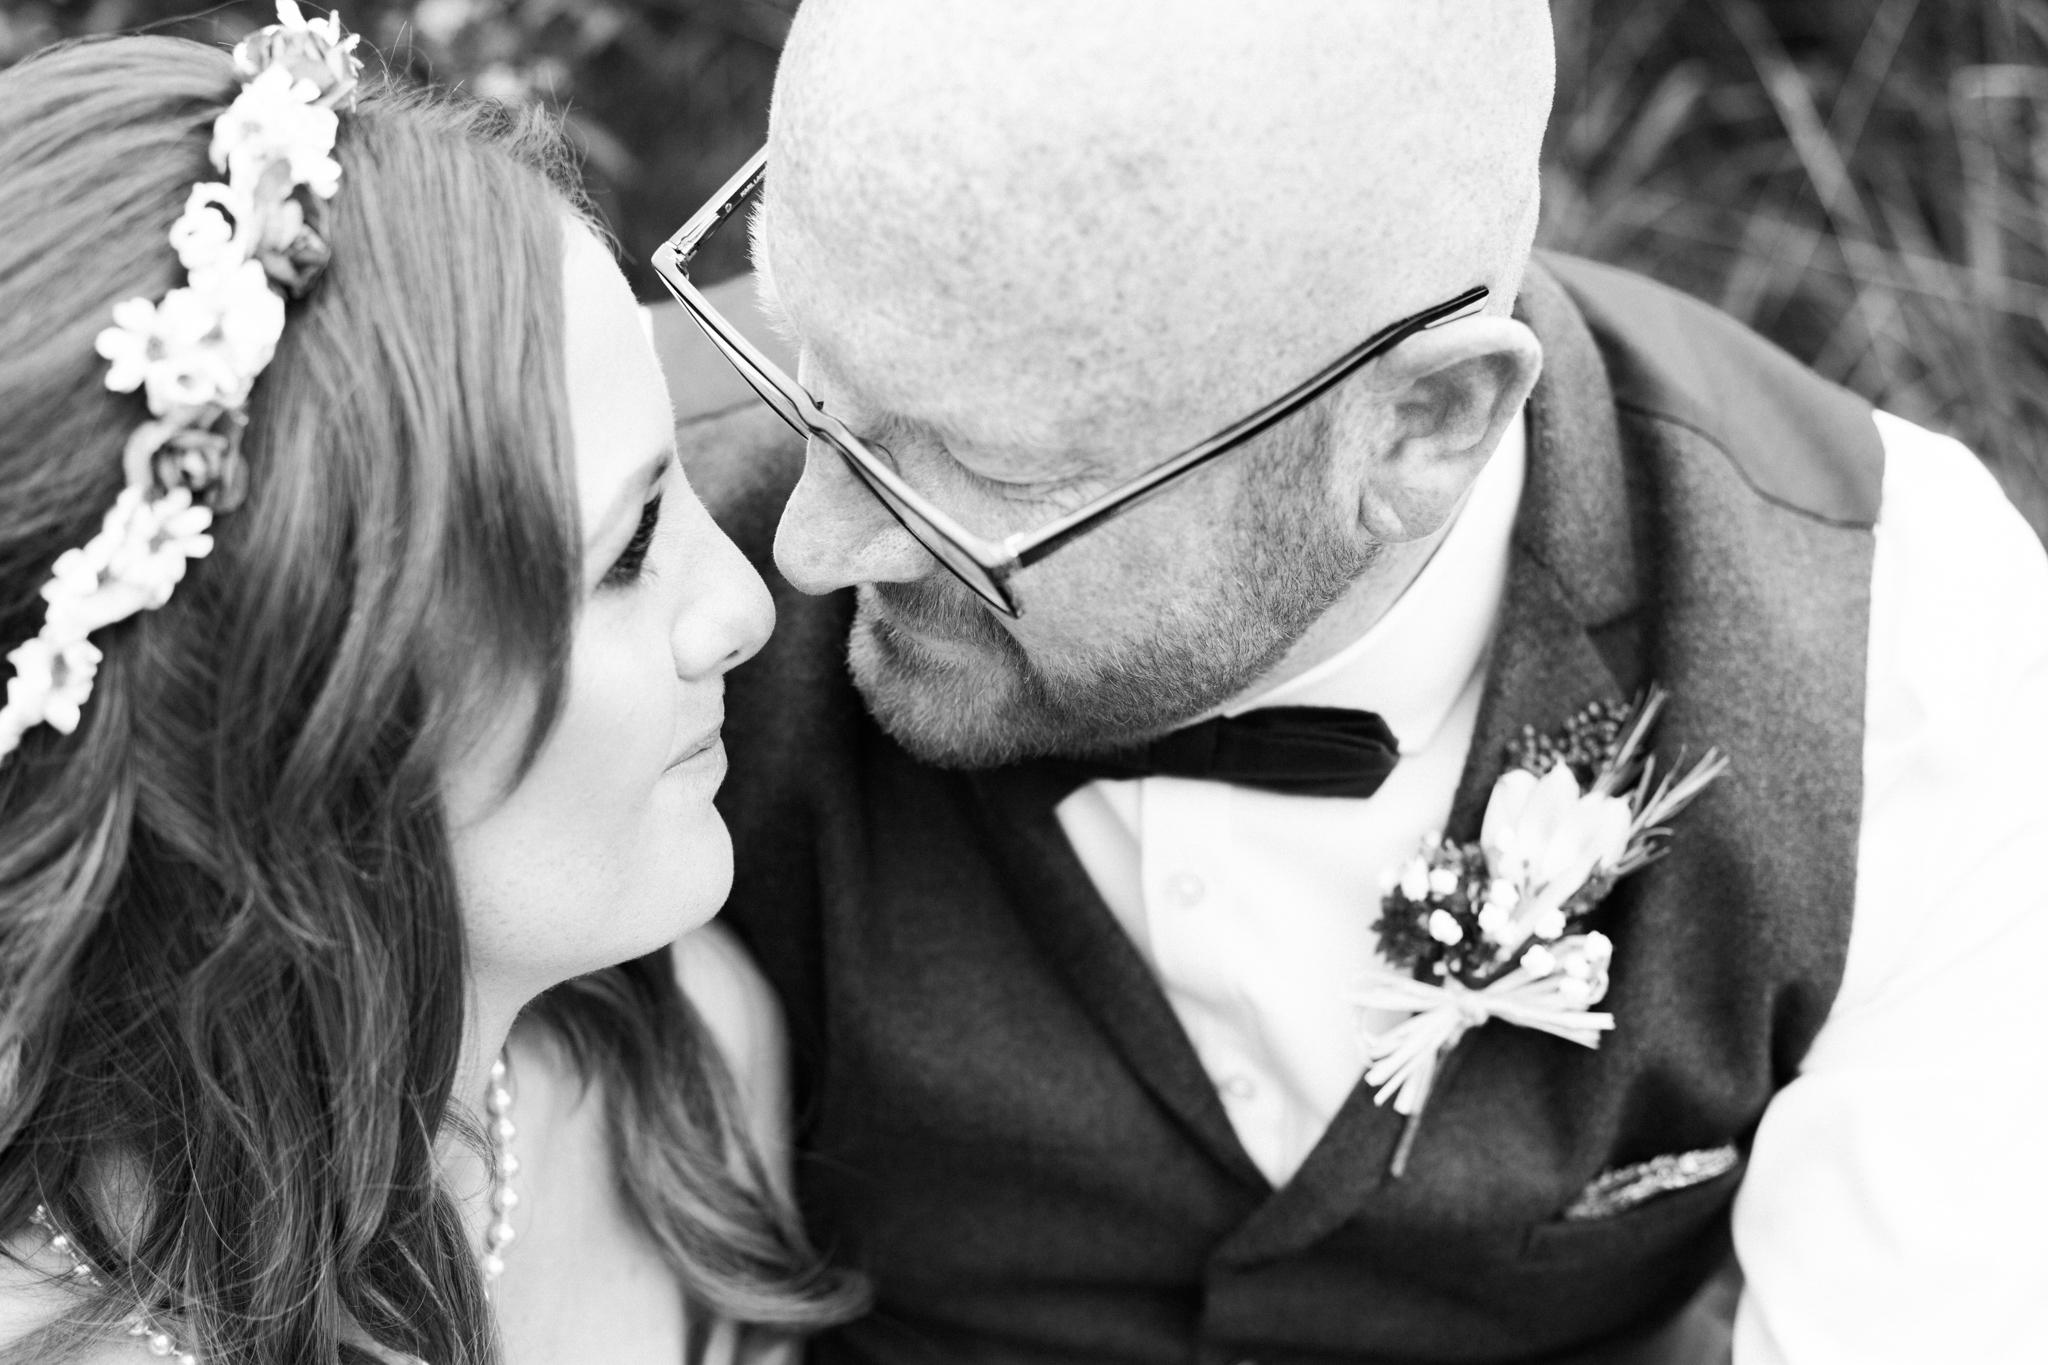 Rowsie & Lee, Swallows Nest Barn Wedding, Cotswold wedding photographer, Warwickshire Wedding Photographer-79.jpg